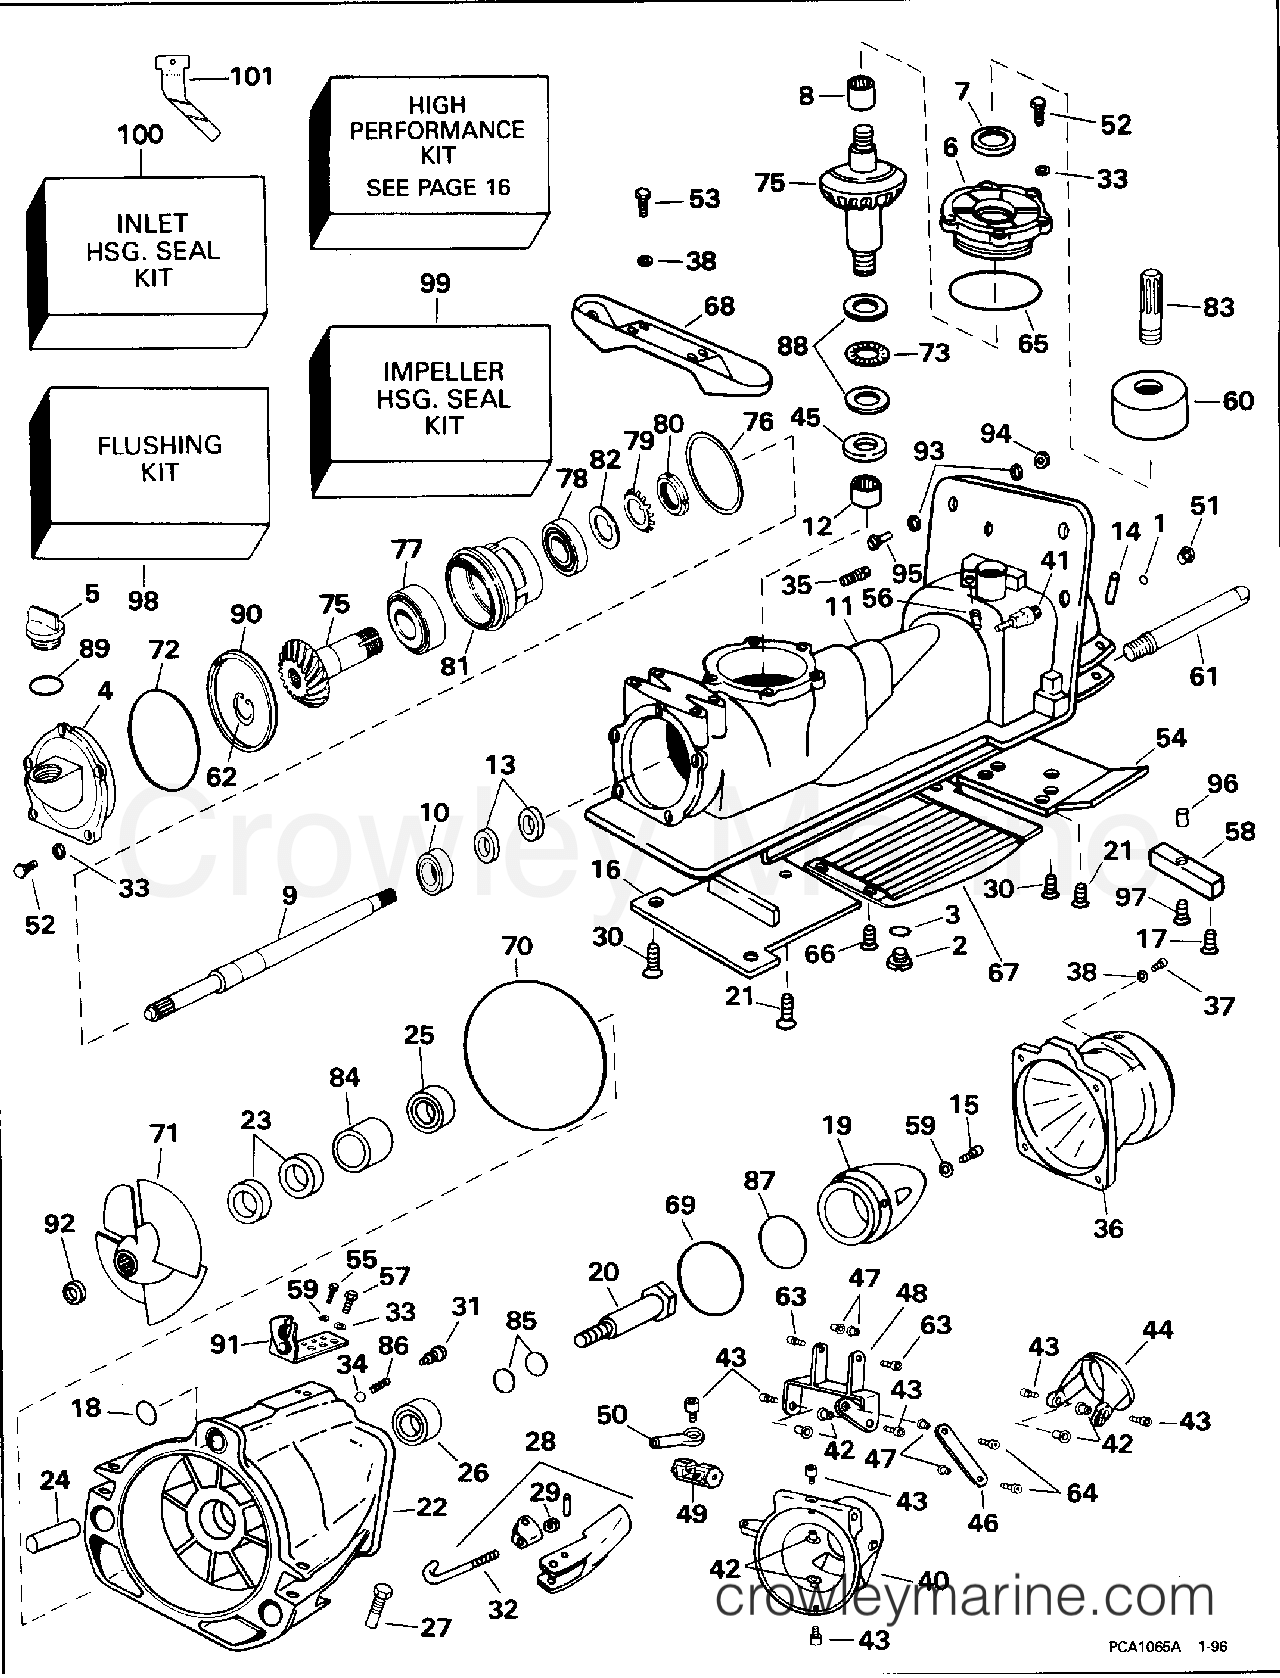 DIAGRAM] Wiring Diagram Omc 115 Turbojet FULL Version HD Quality 115  Turbojet - ATTWIRINGPDF.EVALINKA.FRWiring And Fuse Database - evalinka